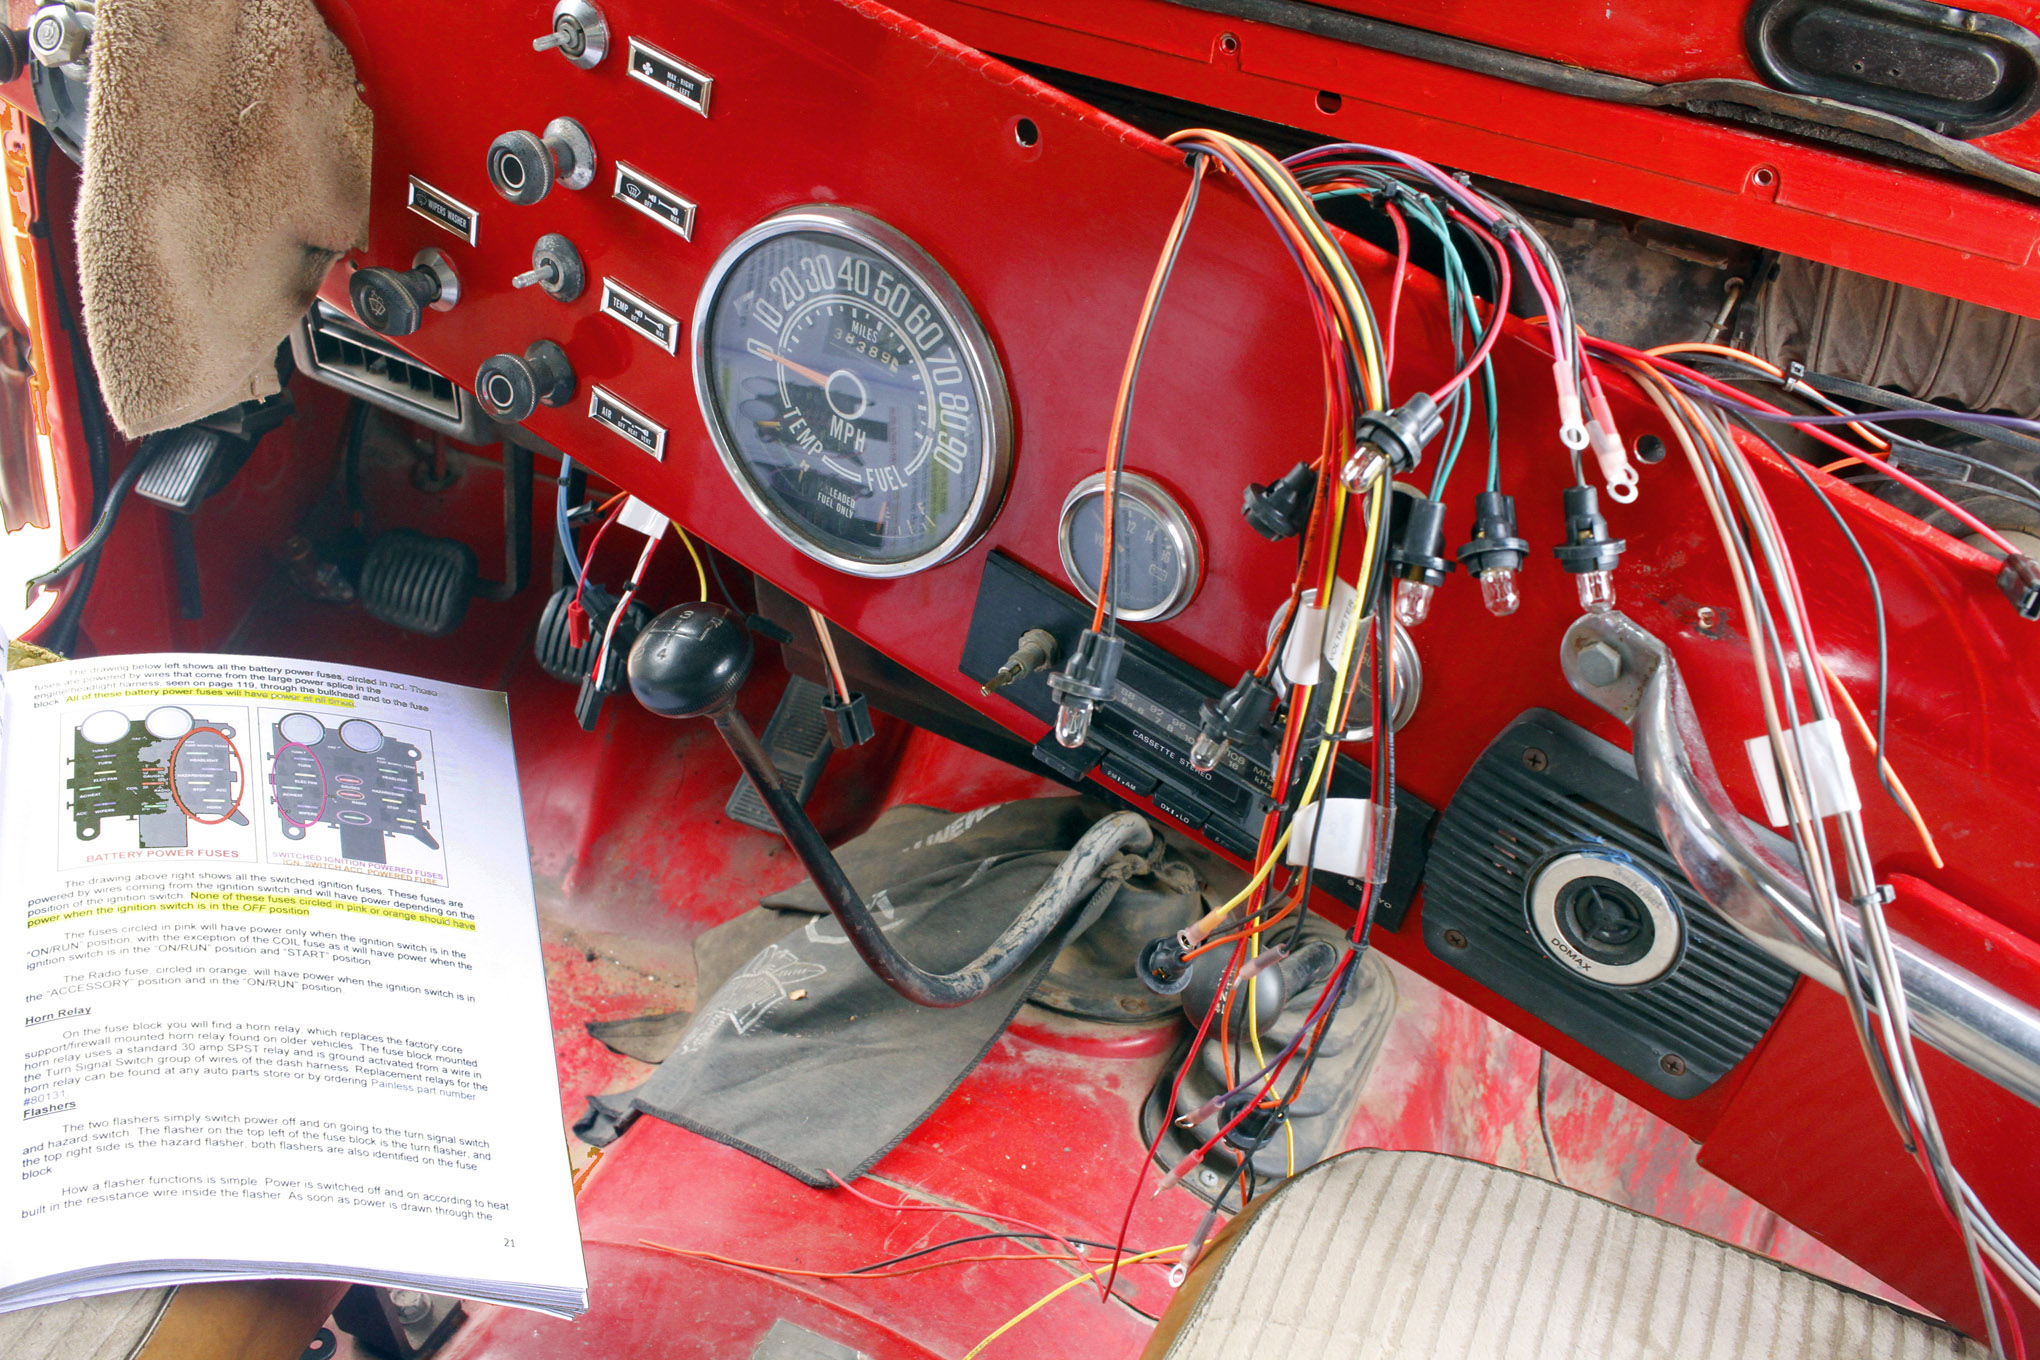 Cj7 Dash Wiring Harness Route   Wiring Diagrams Jeep Cj Dash Wiring Harness on